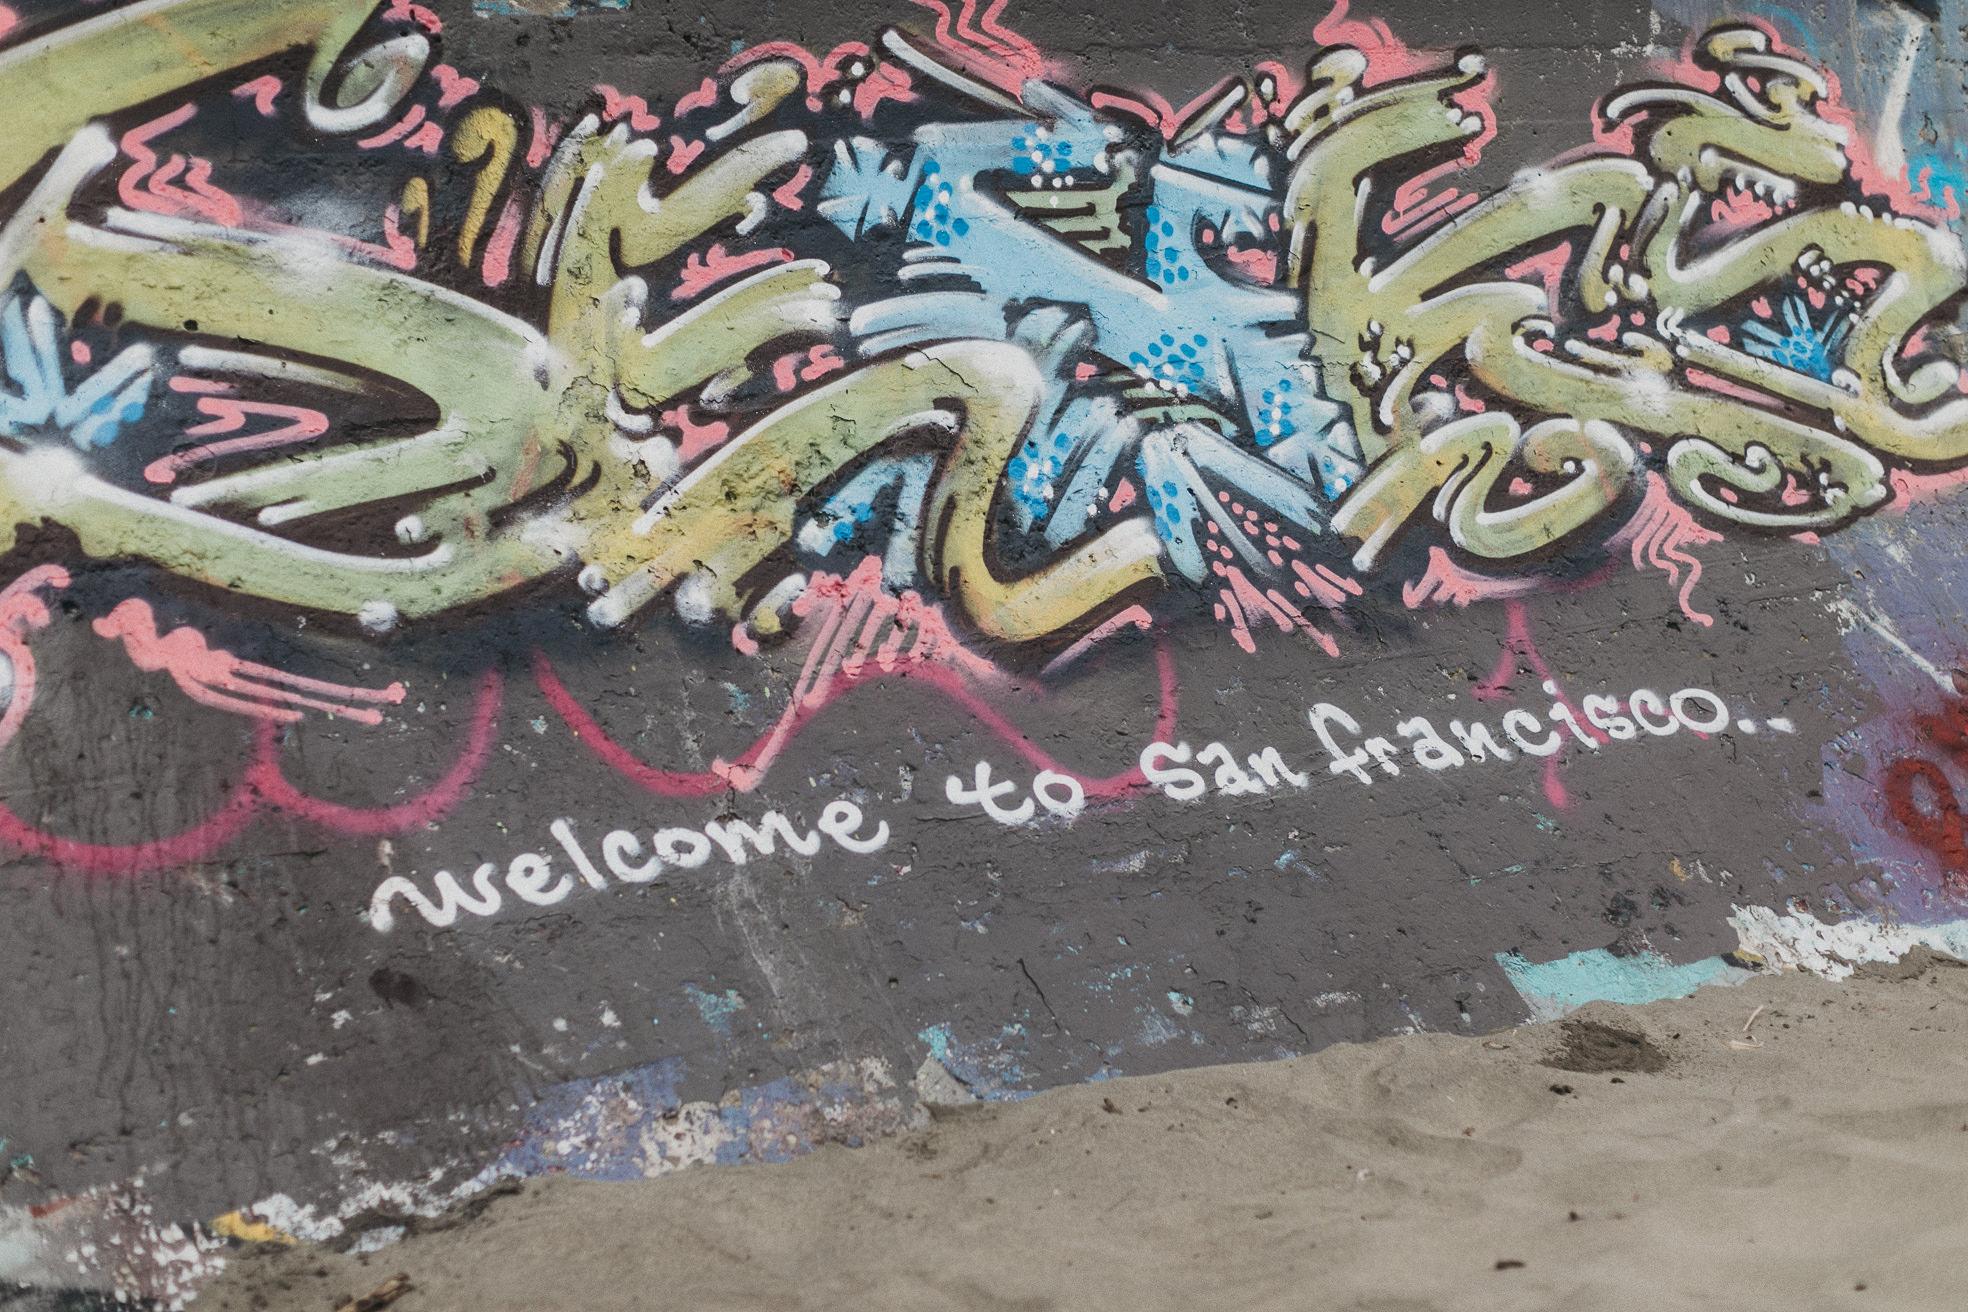 San-Francisco-BildervomLeben-8135